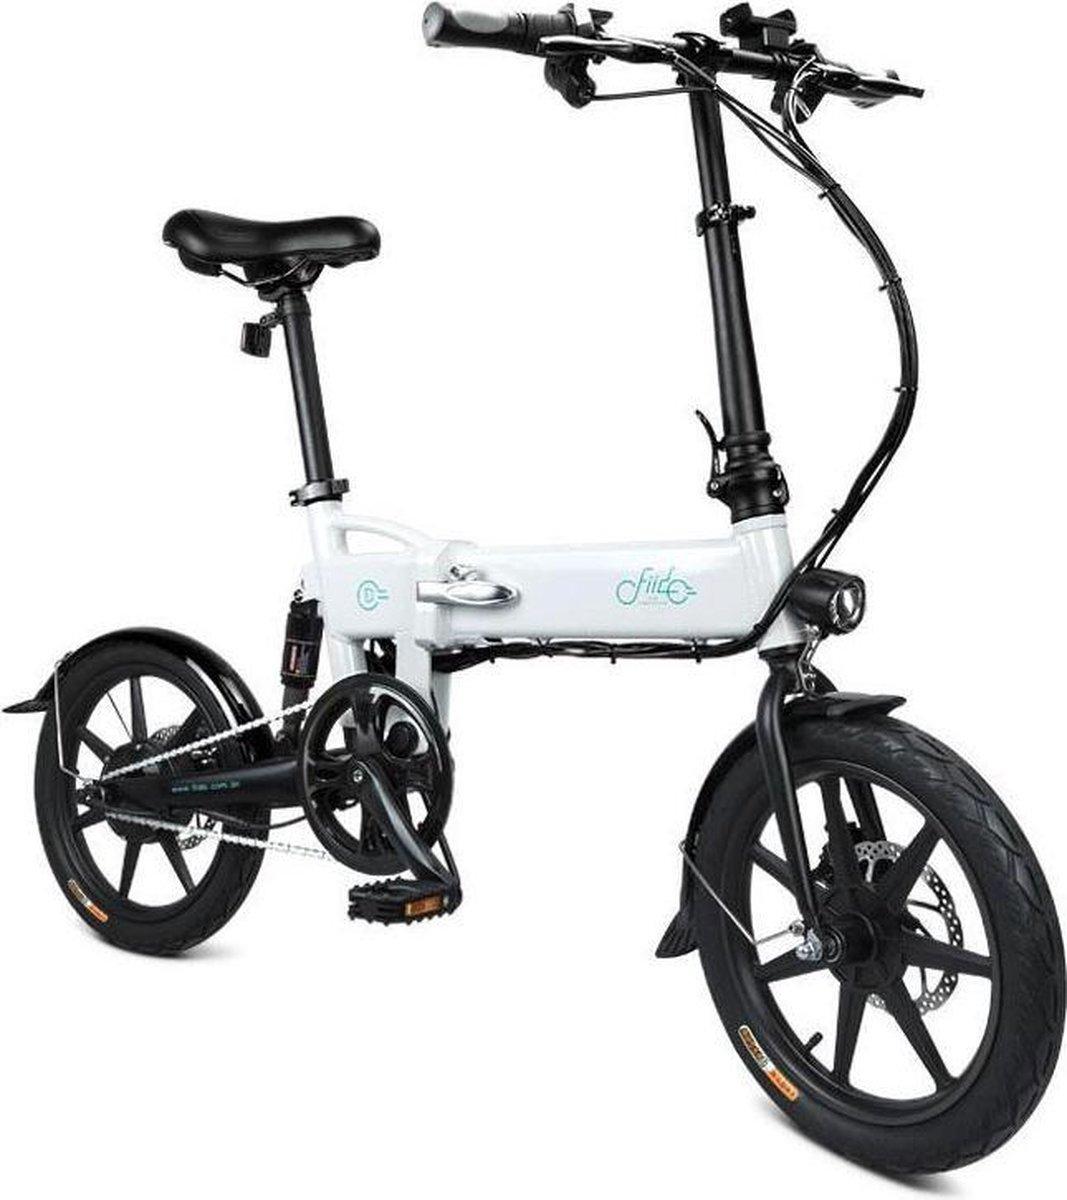 Fiido D2 Elektrische Vouwfiets - Wit - 16 inch wielen